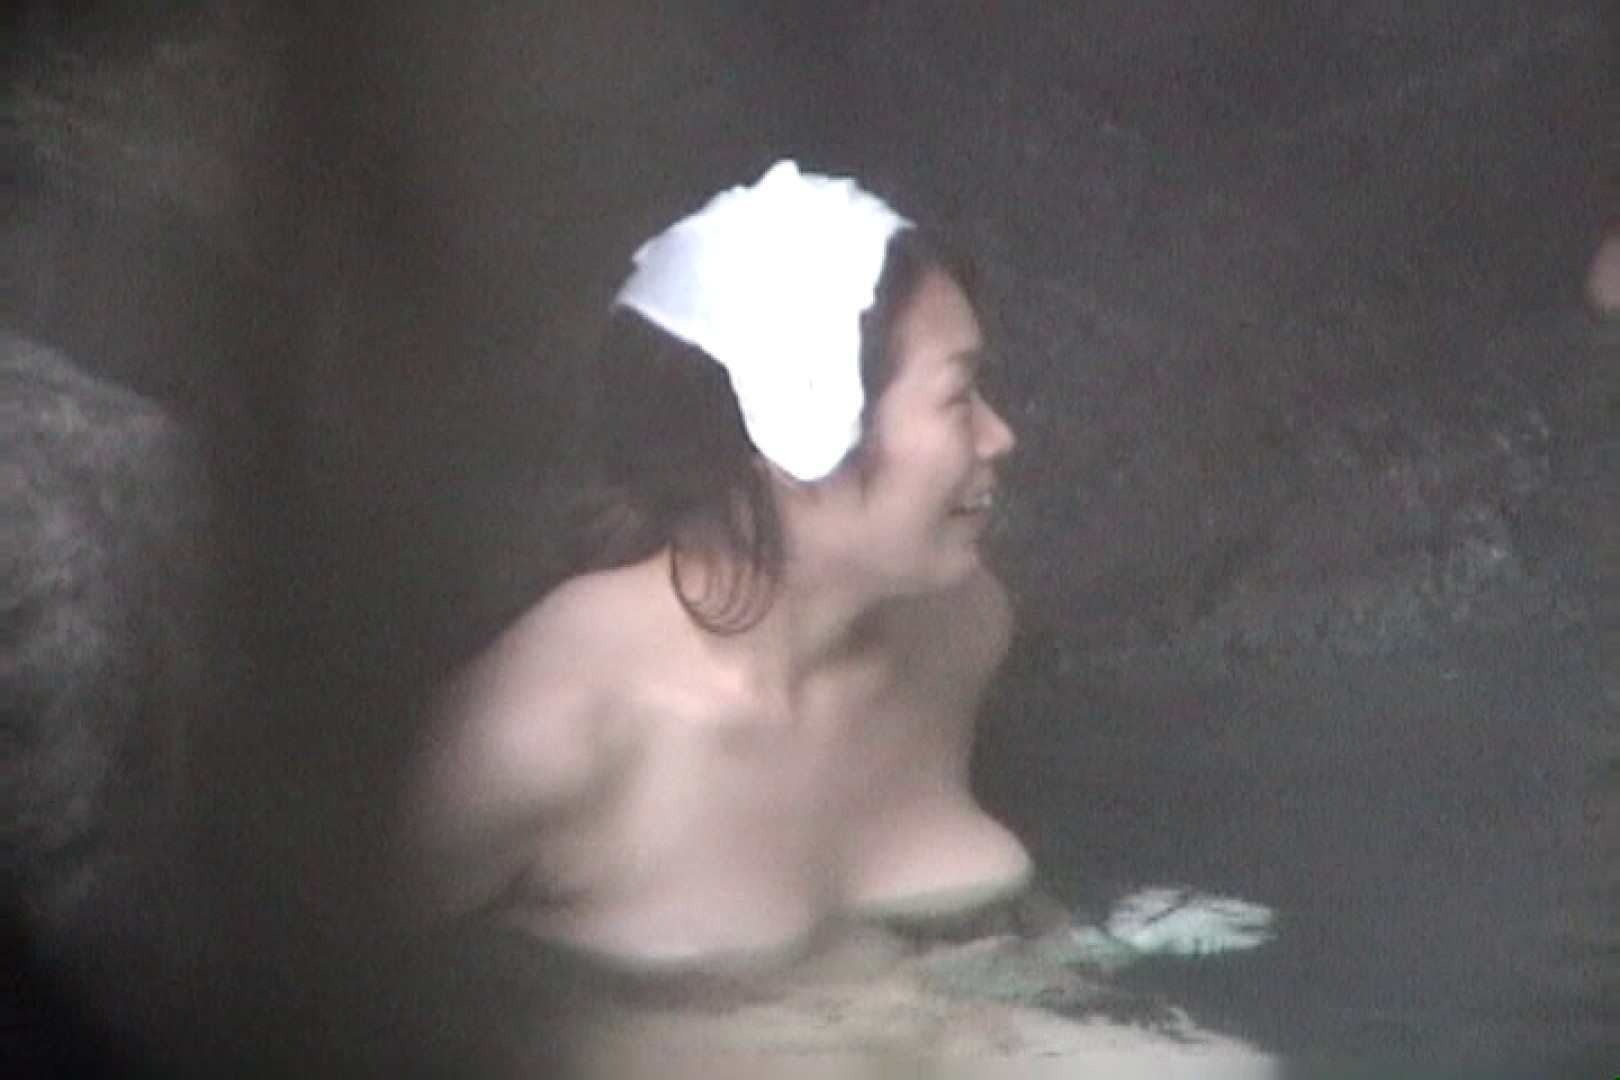 Aquaな露天風呂Vol.71【VIP限定】 盗撮 のぞき動画画像 107画像 53